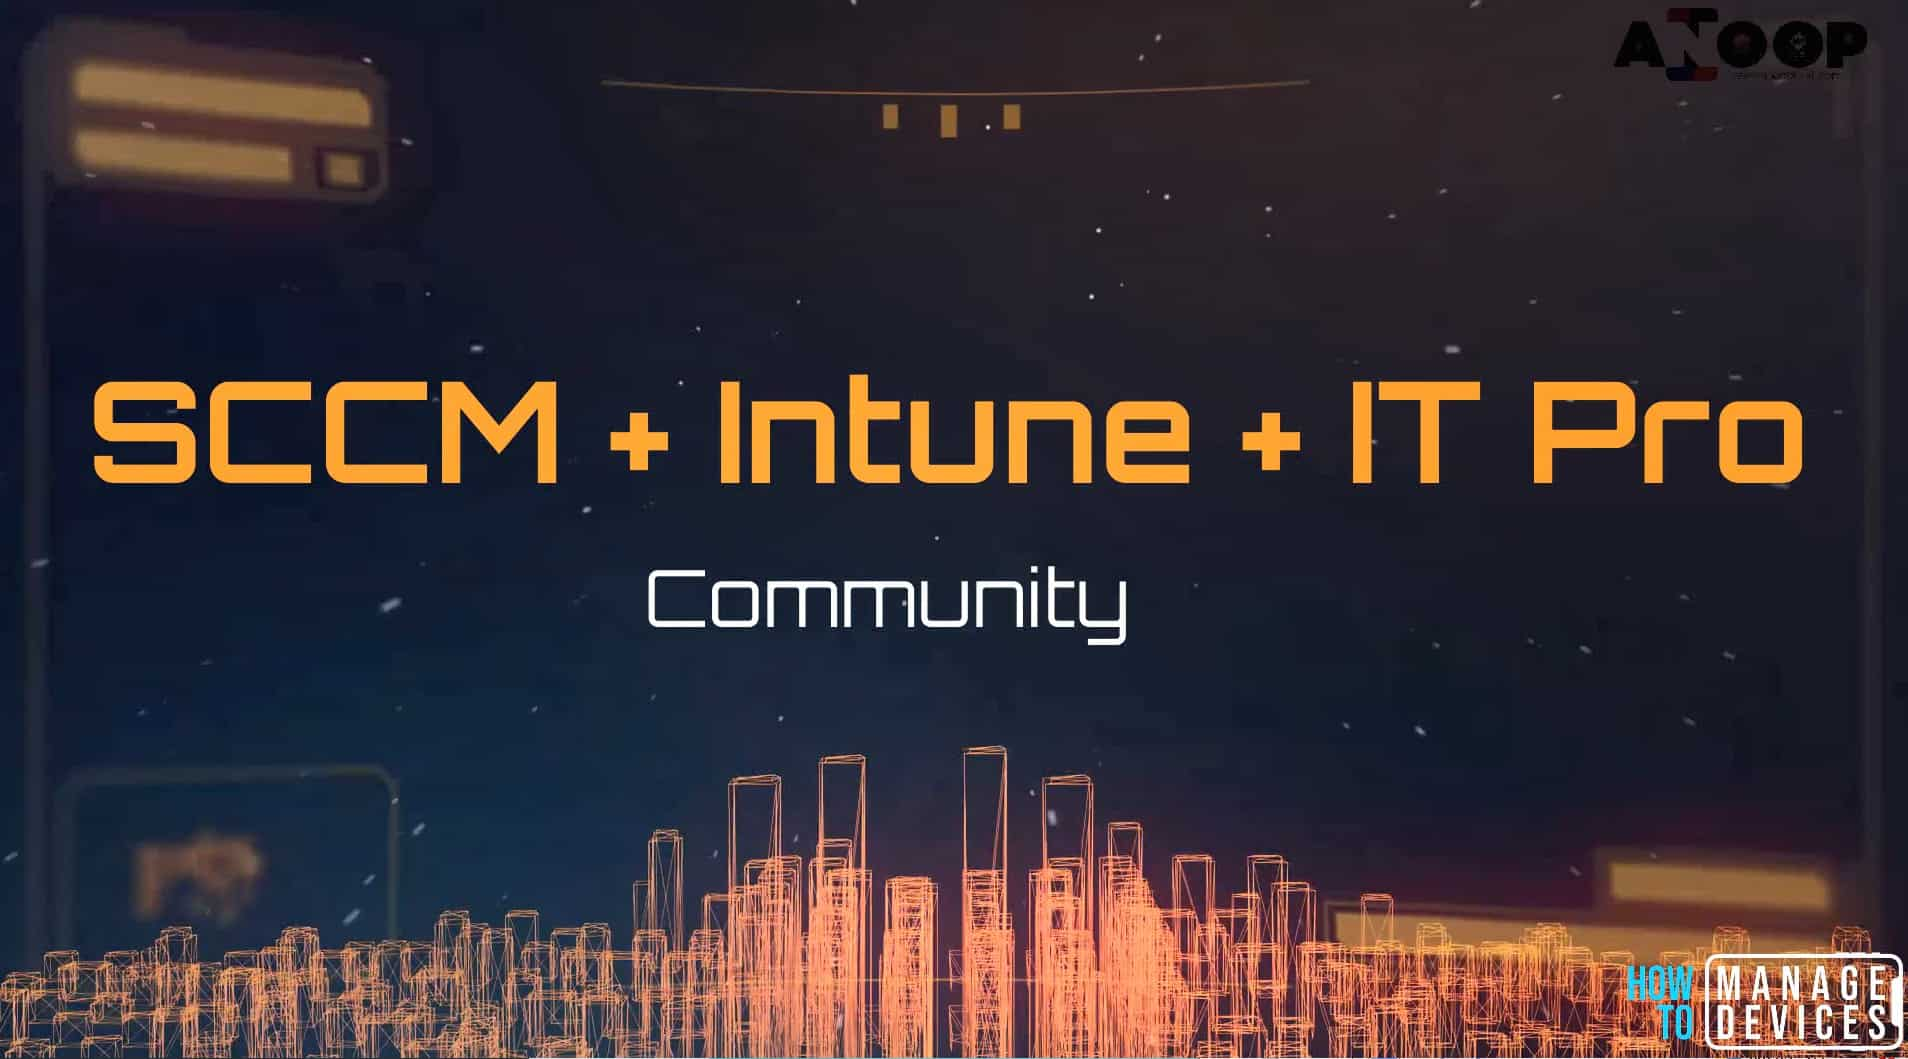 Online SCCM Intune Communities -Online SCCM Intune Community